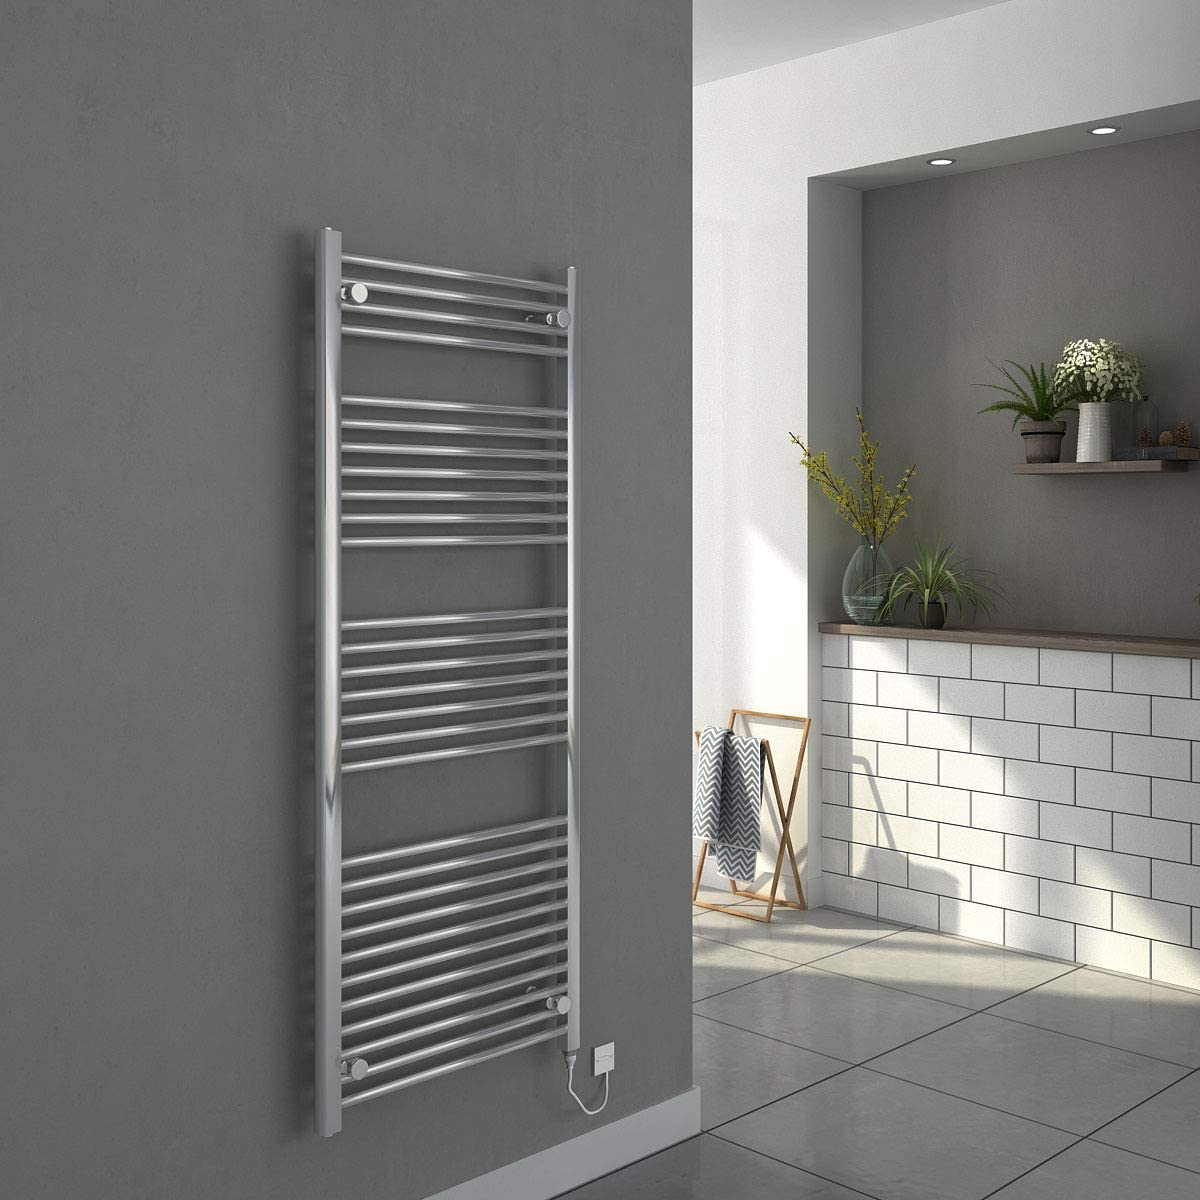 Thermostatic Electric Curved Bathroom Heated Towel Rail Warmer Radiator Rad 800 x 500 mm Vienna Chrome